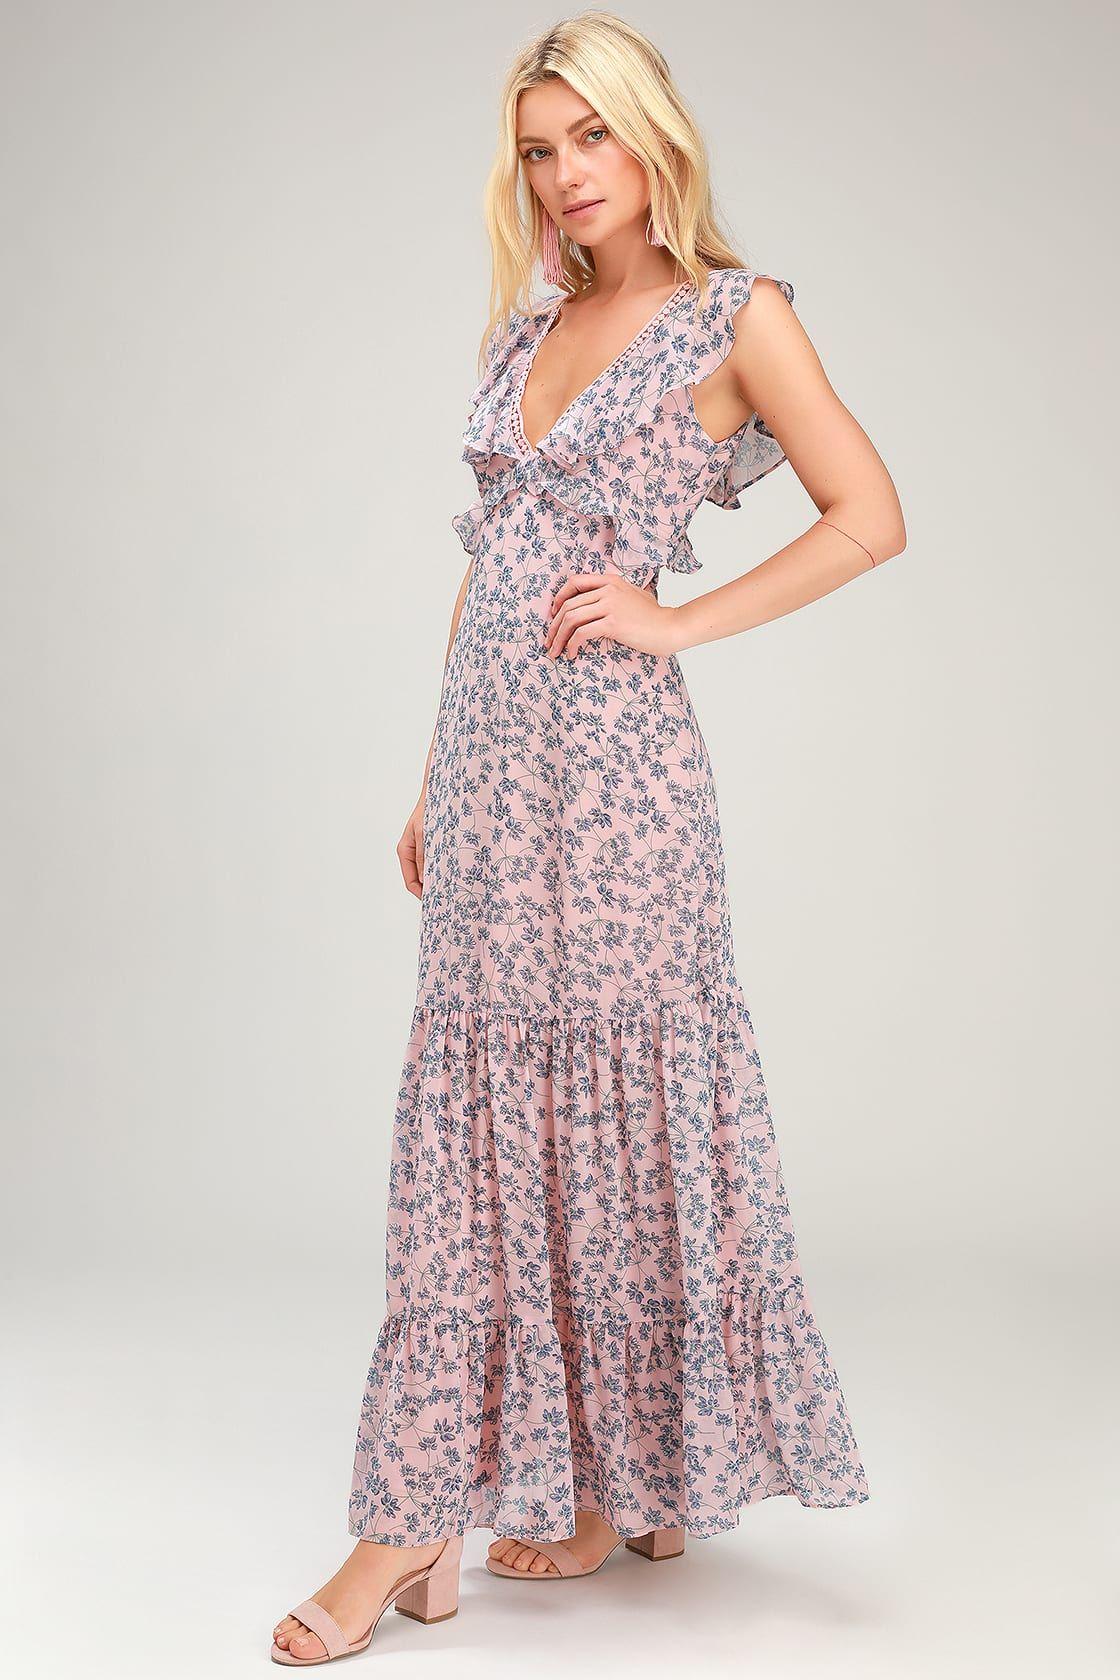 Darling Daydream Blue And Pink Floral Print Ruffled Maxi Dress Ruffled Maxi Dress Pink Maxi Dress Maxi Dress [ 1680 x 1120 Pixel ]